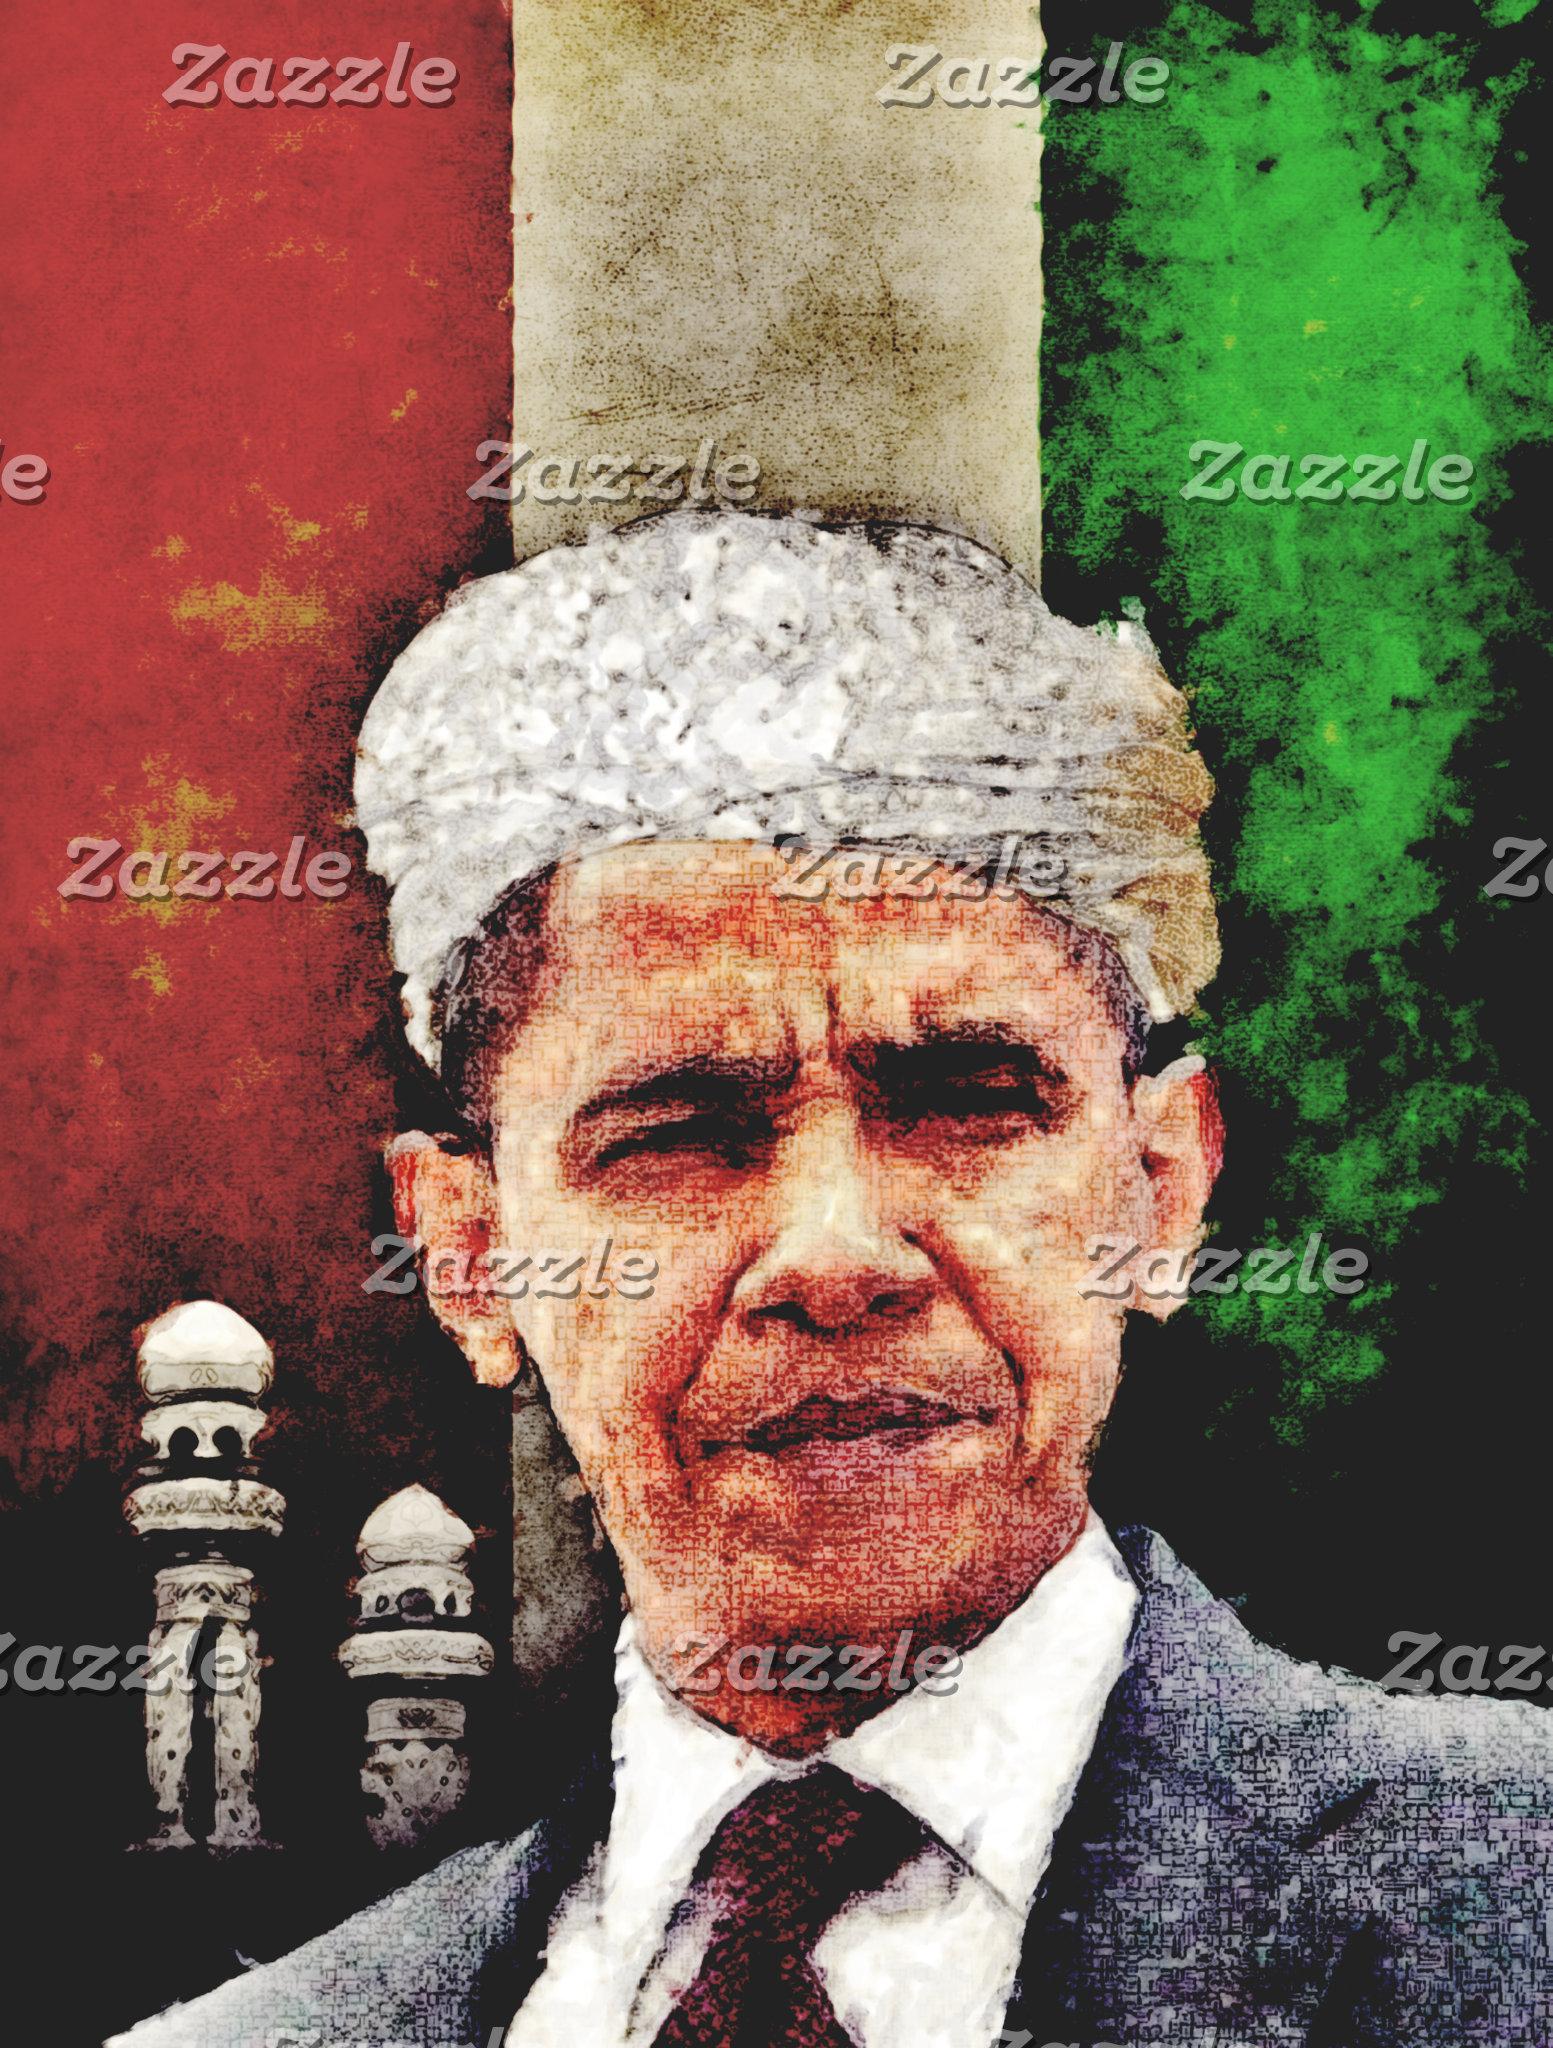 Obama Supports Iranian Dictatorship